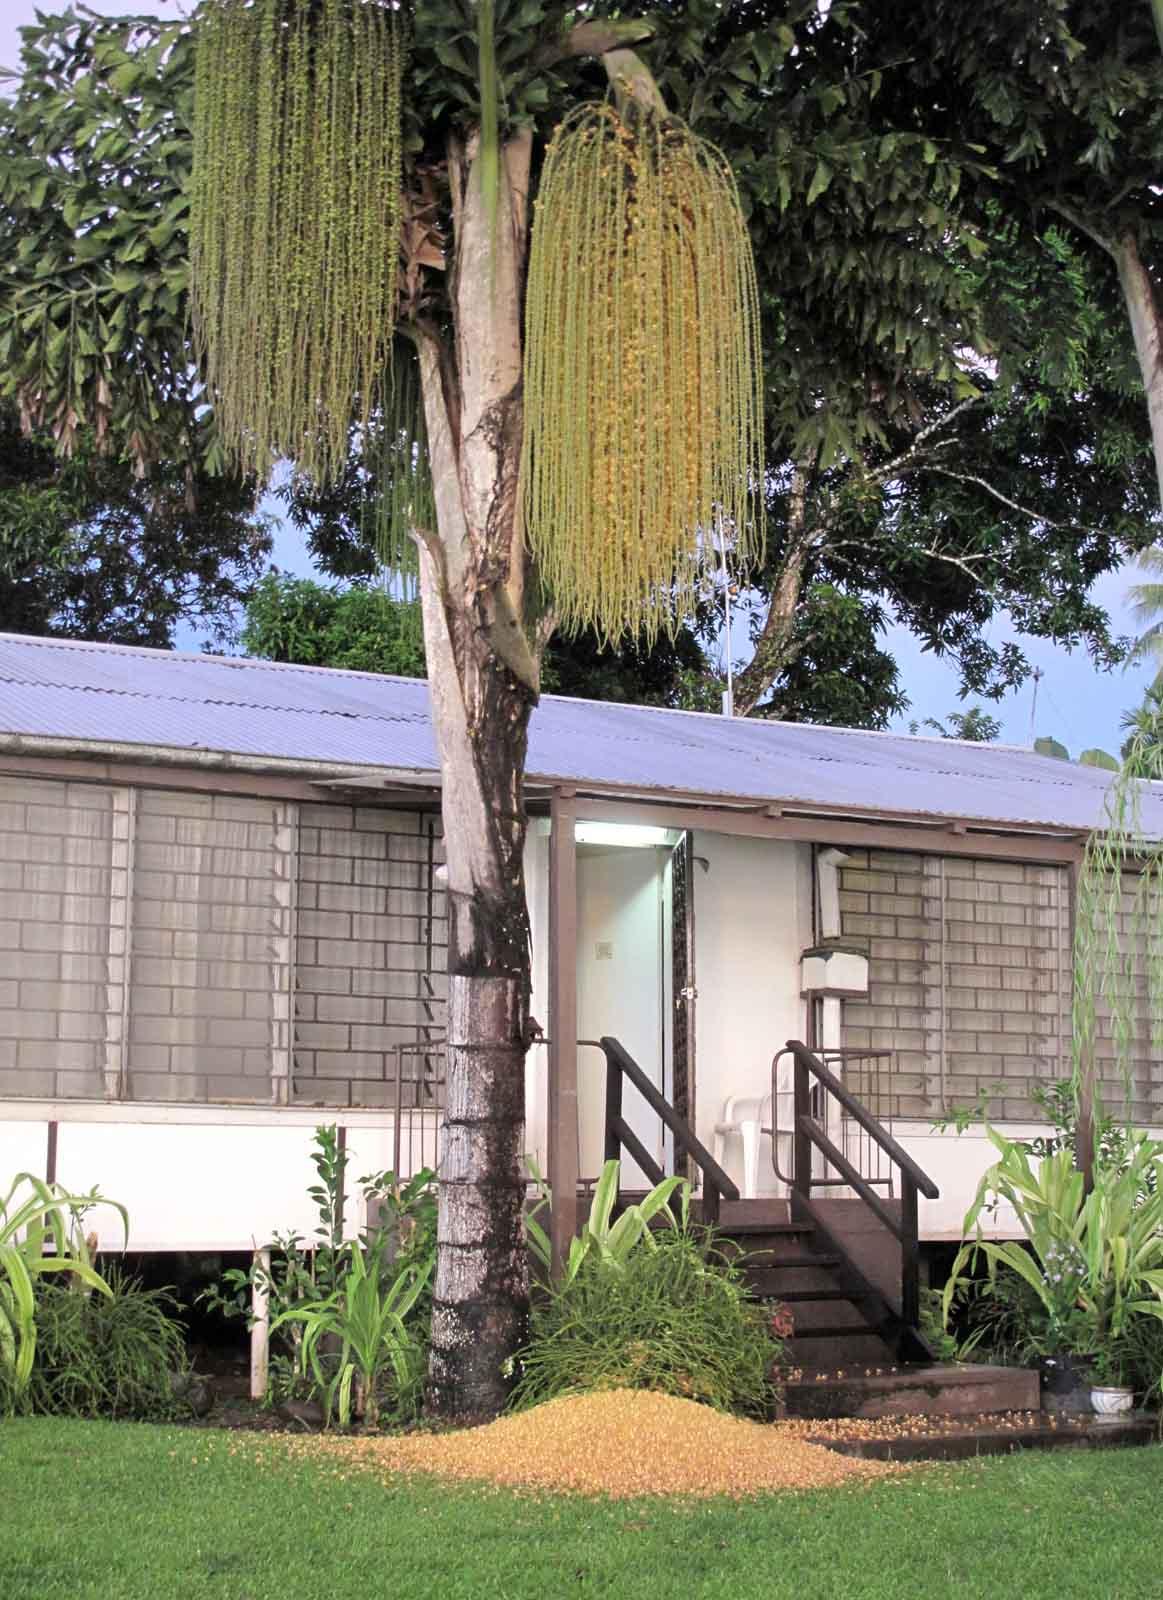 Fishtail palm